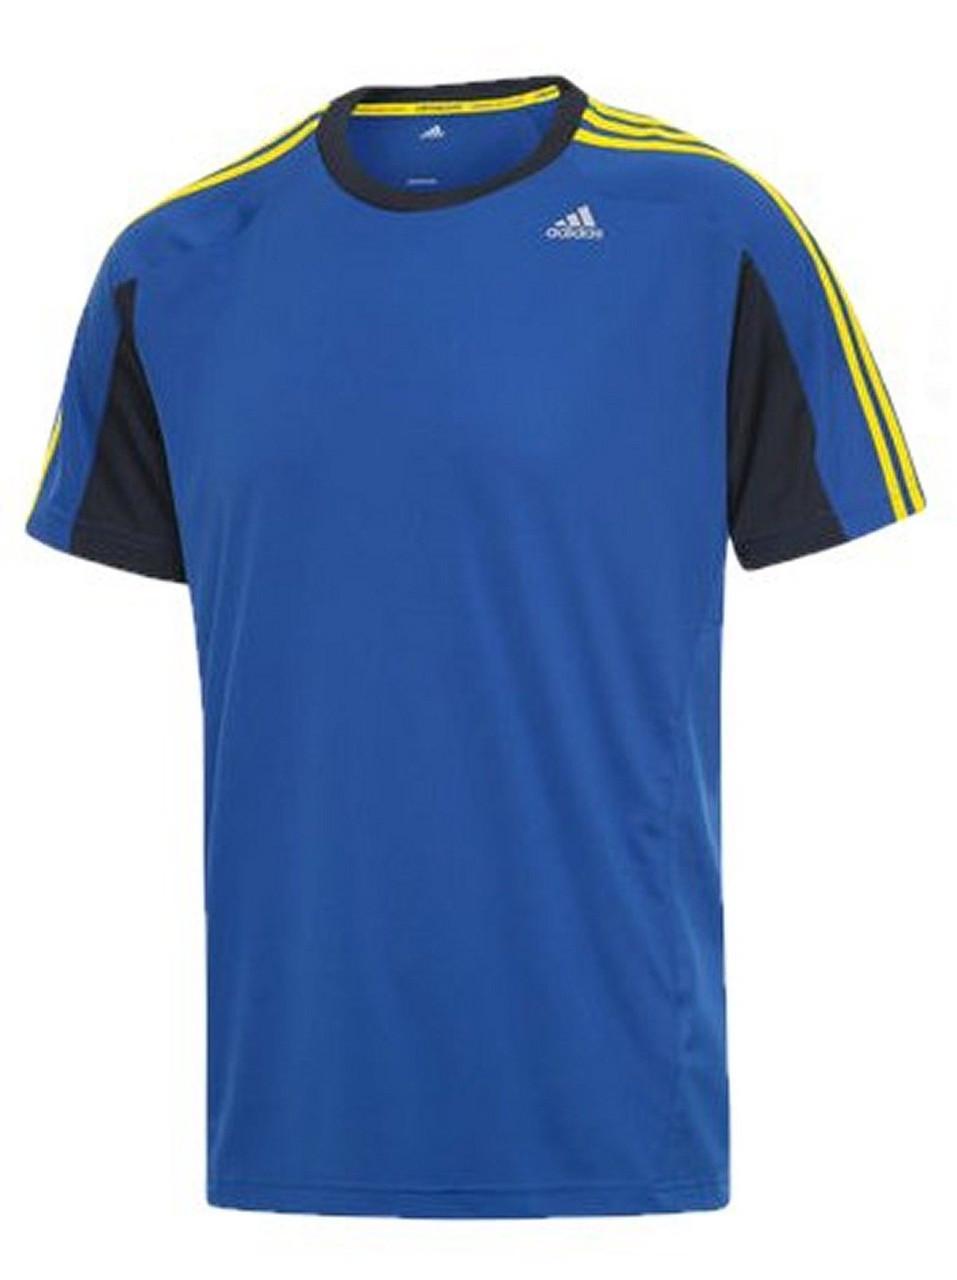 Футболка спортивная, мужская adidas REF TEE G83583 адидас